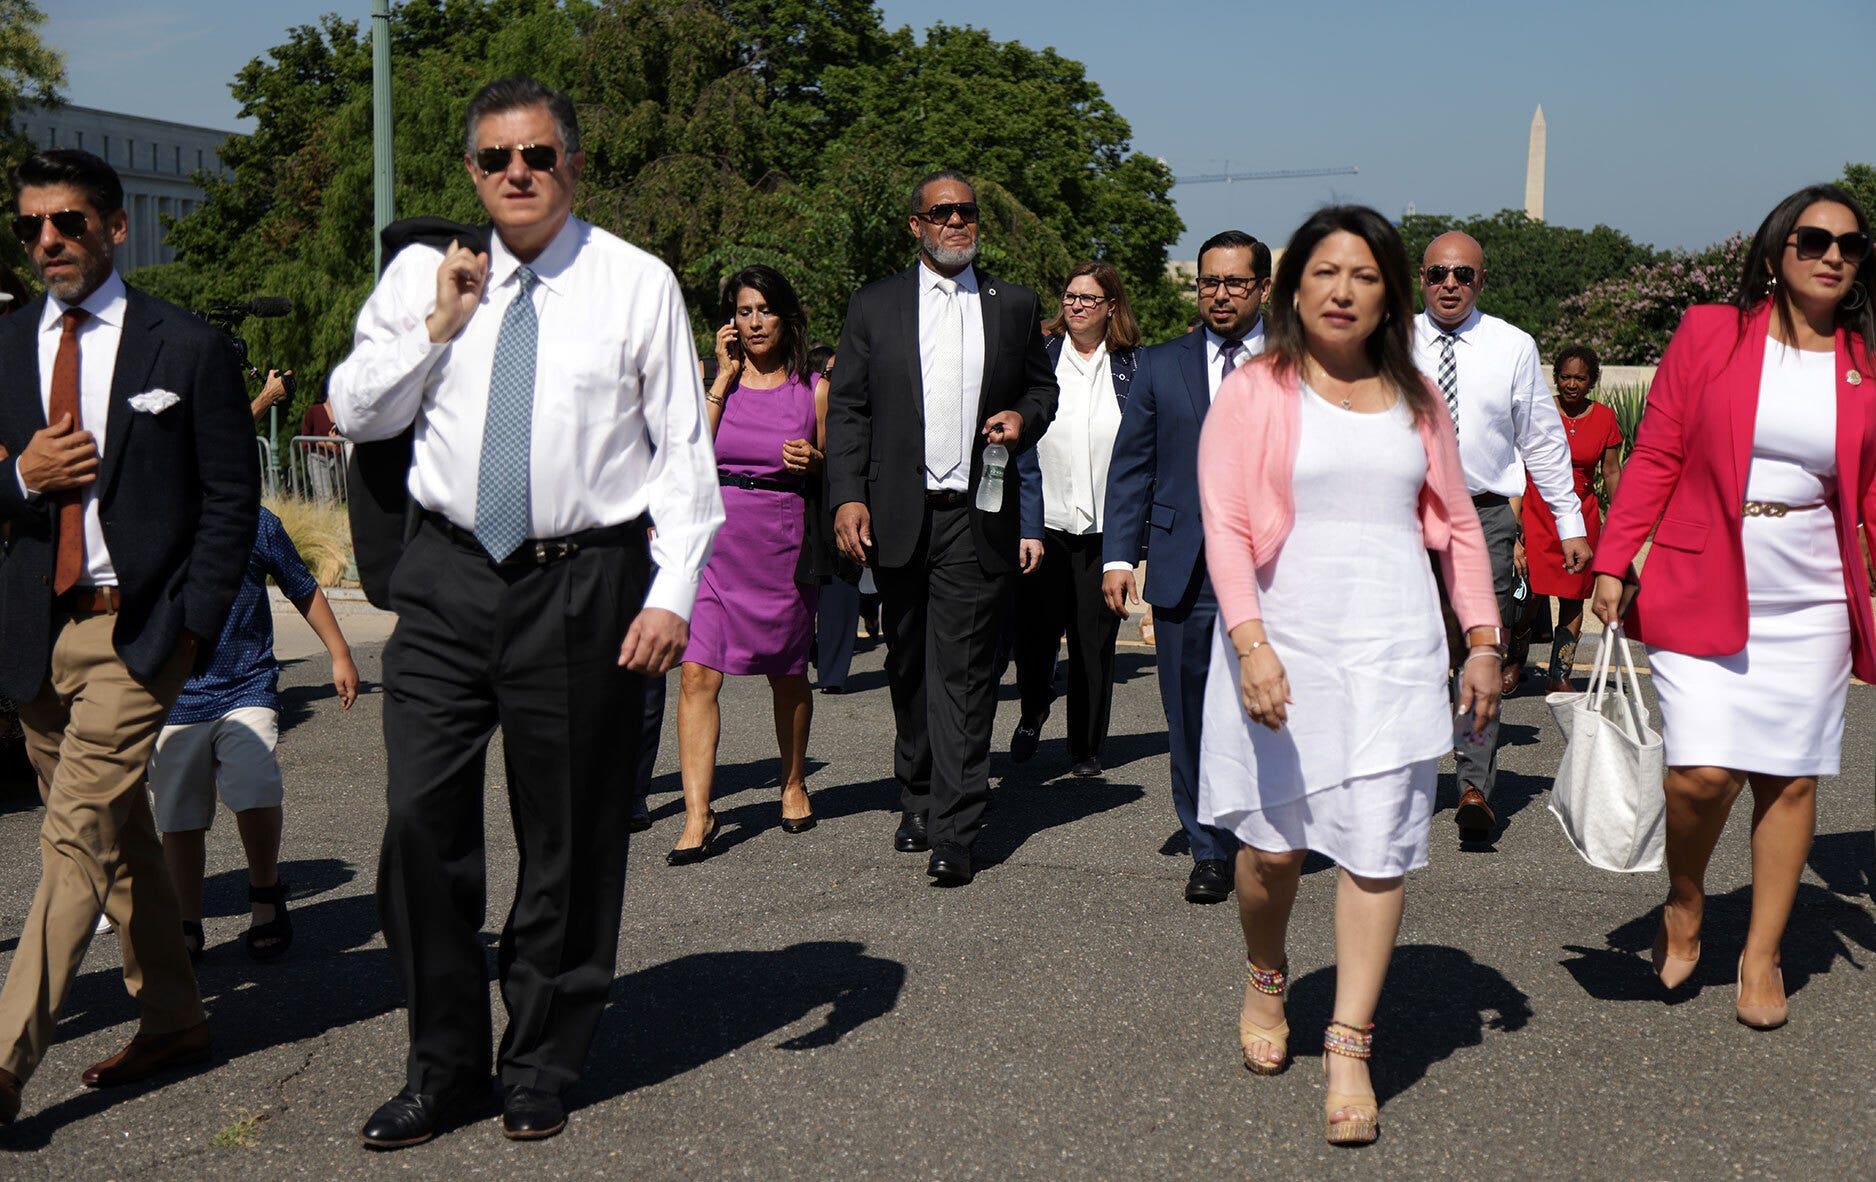 Texas Democrats in DC: Photos of their trip